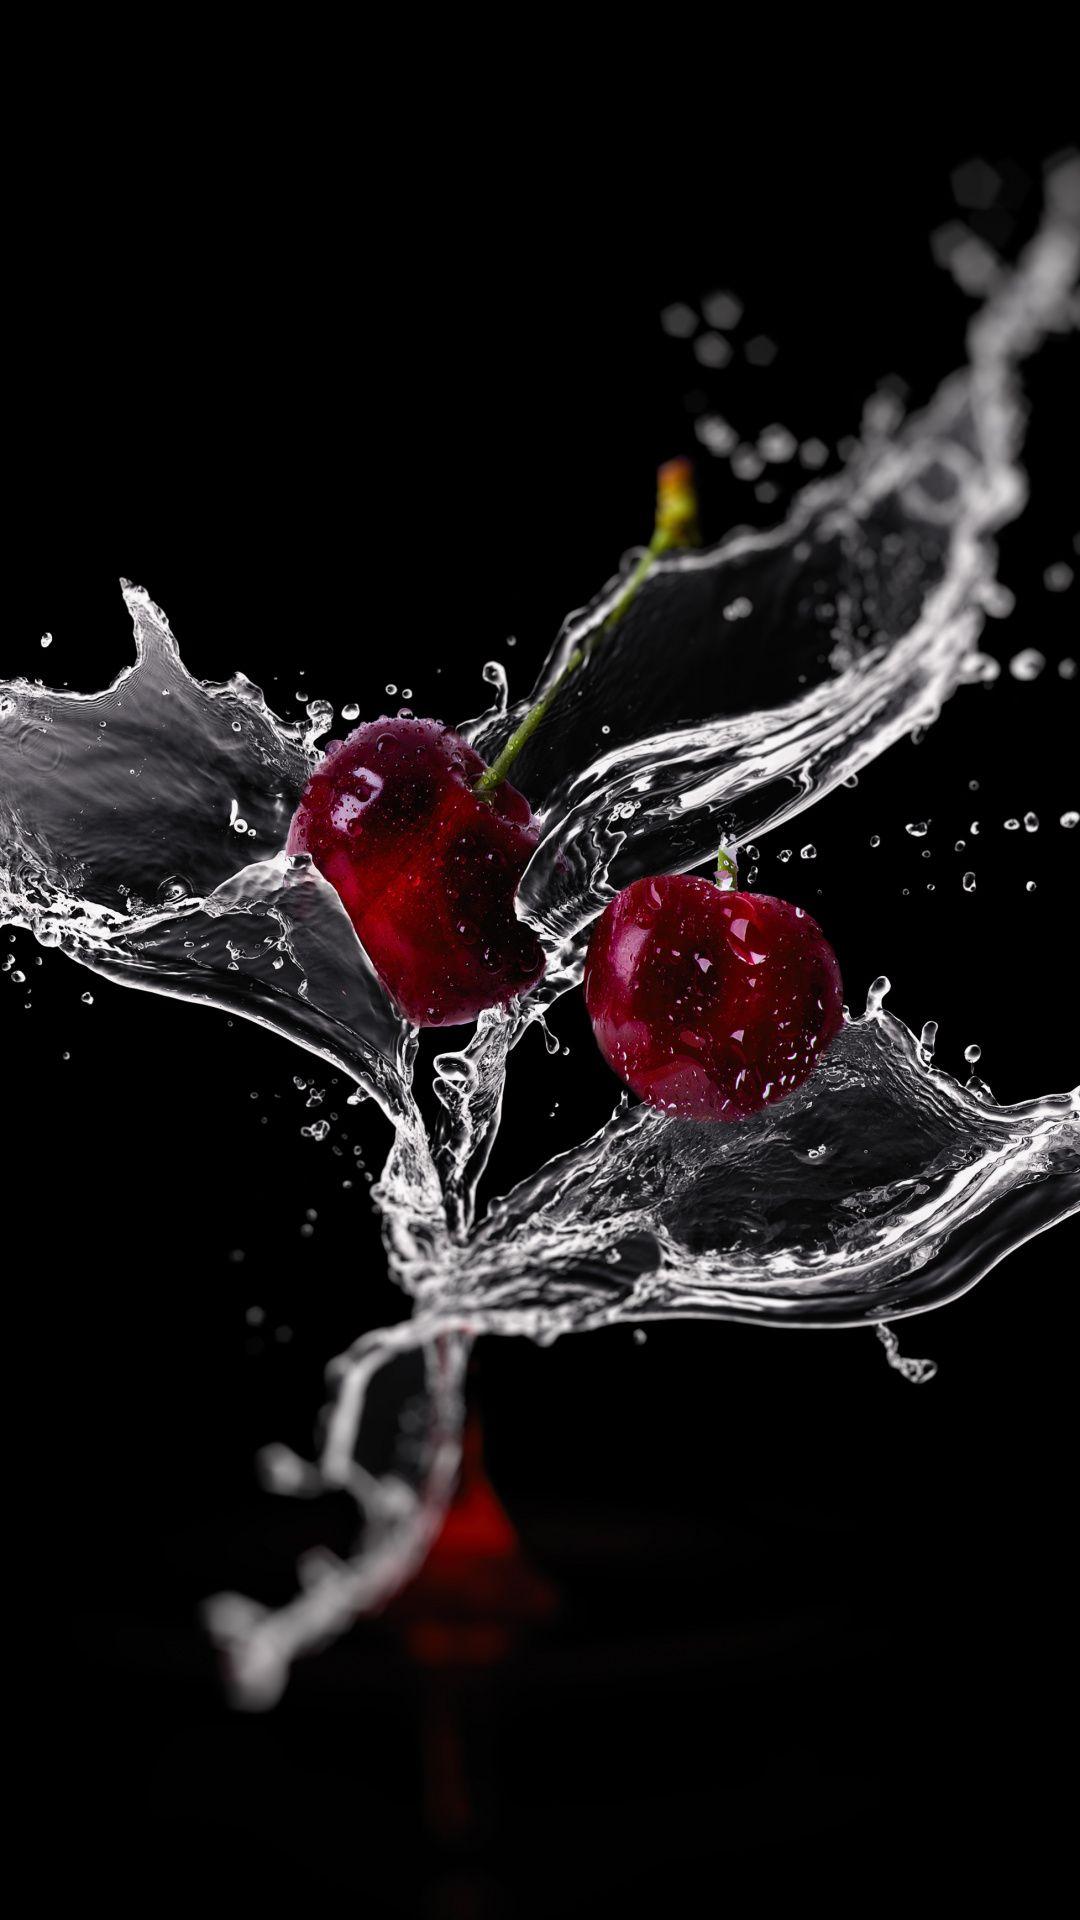 Wallpapers Water Food Graphic Design Fruit Liquid Fotografii Levitacii Fotografiya Fruktov Fruktovoe Iskusstvo